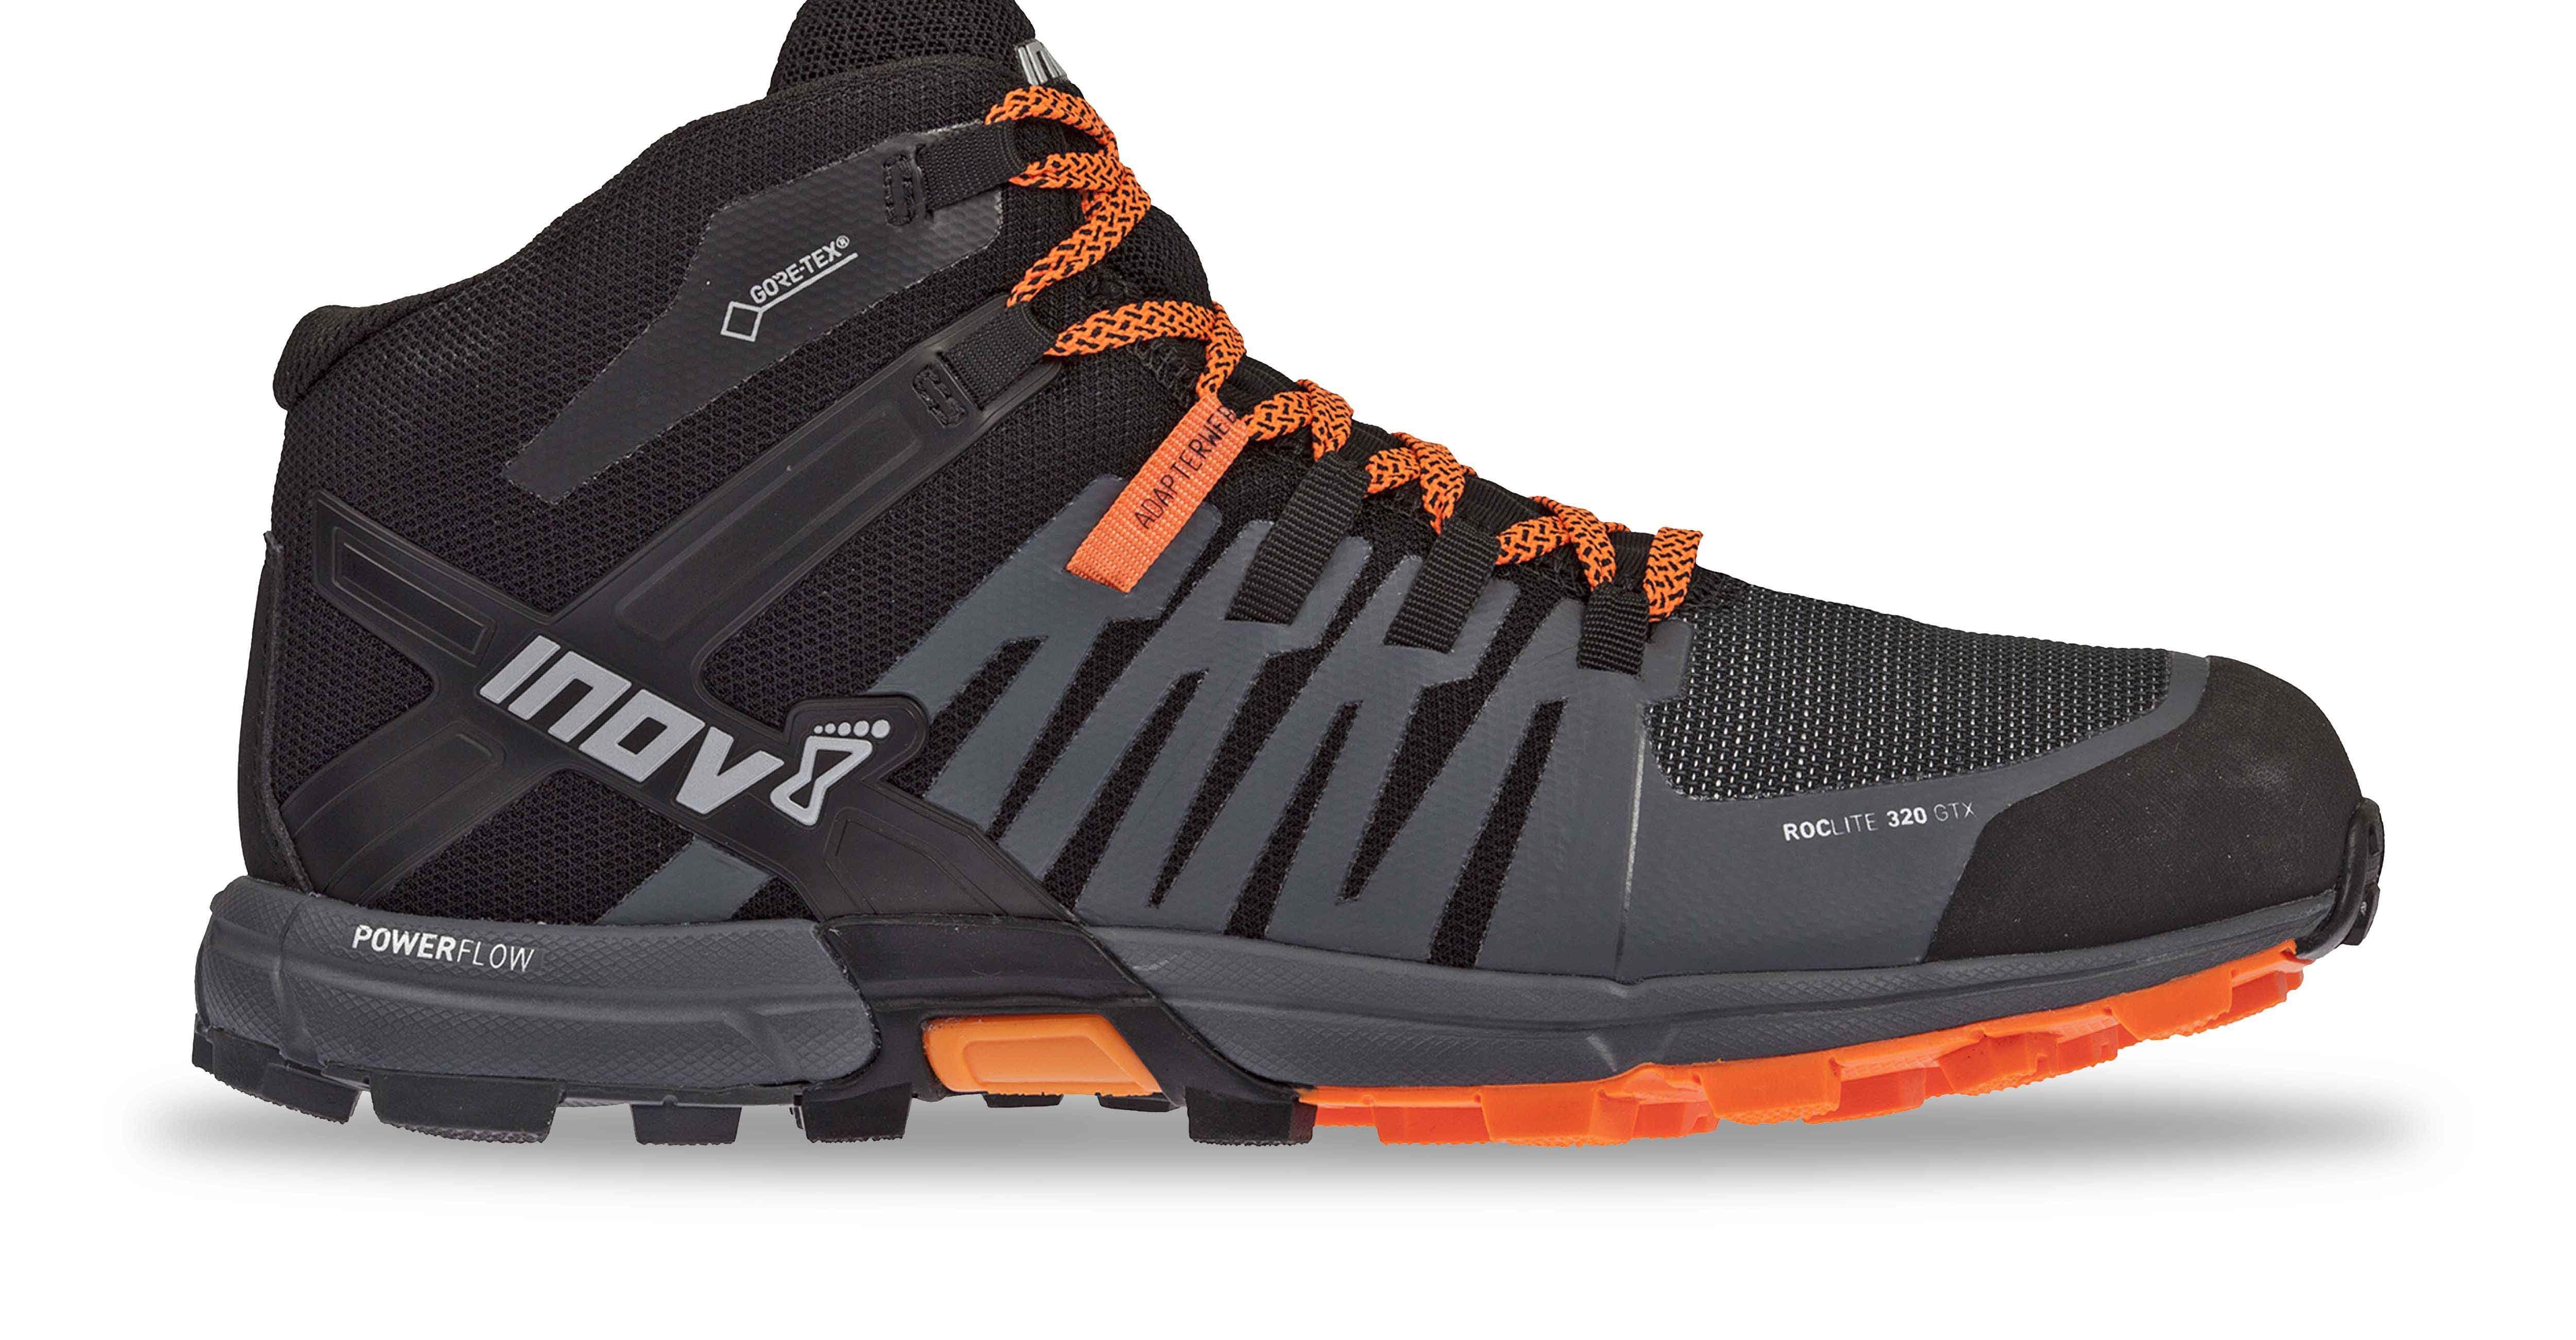 big sale 77b36 7867d Inov8 Roclite 320 GTX Trail Running Shoes - Men's